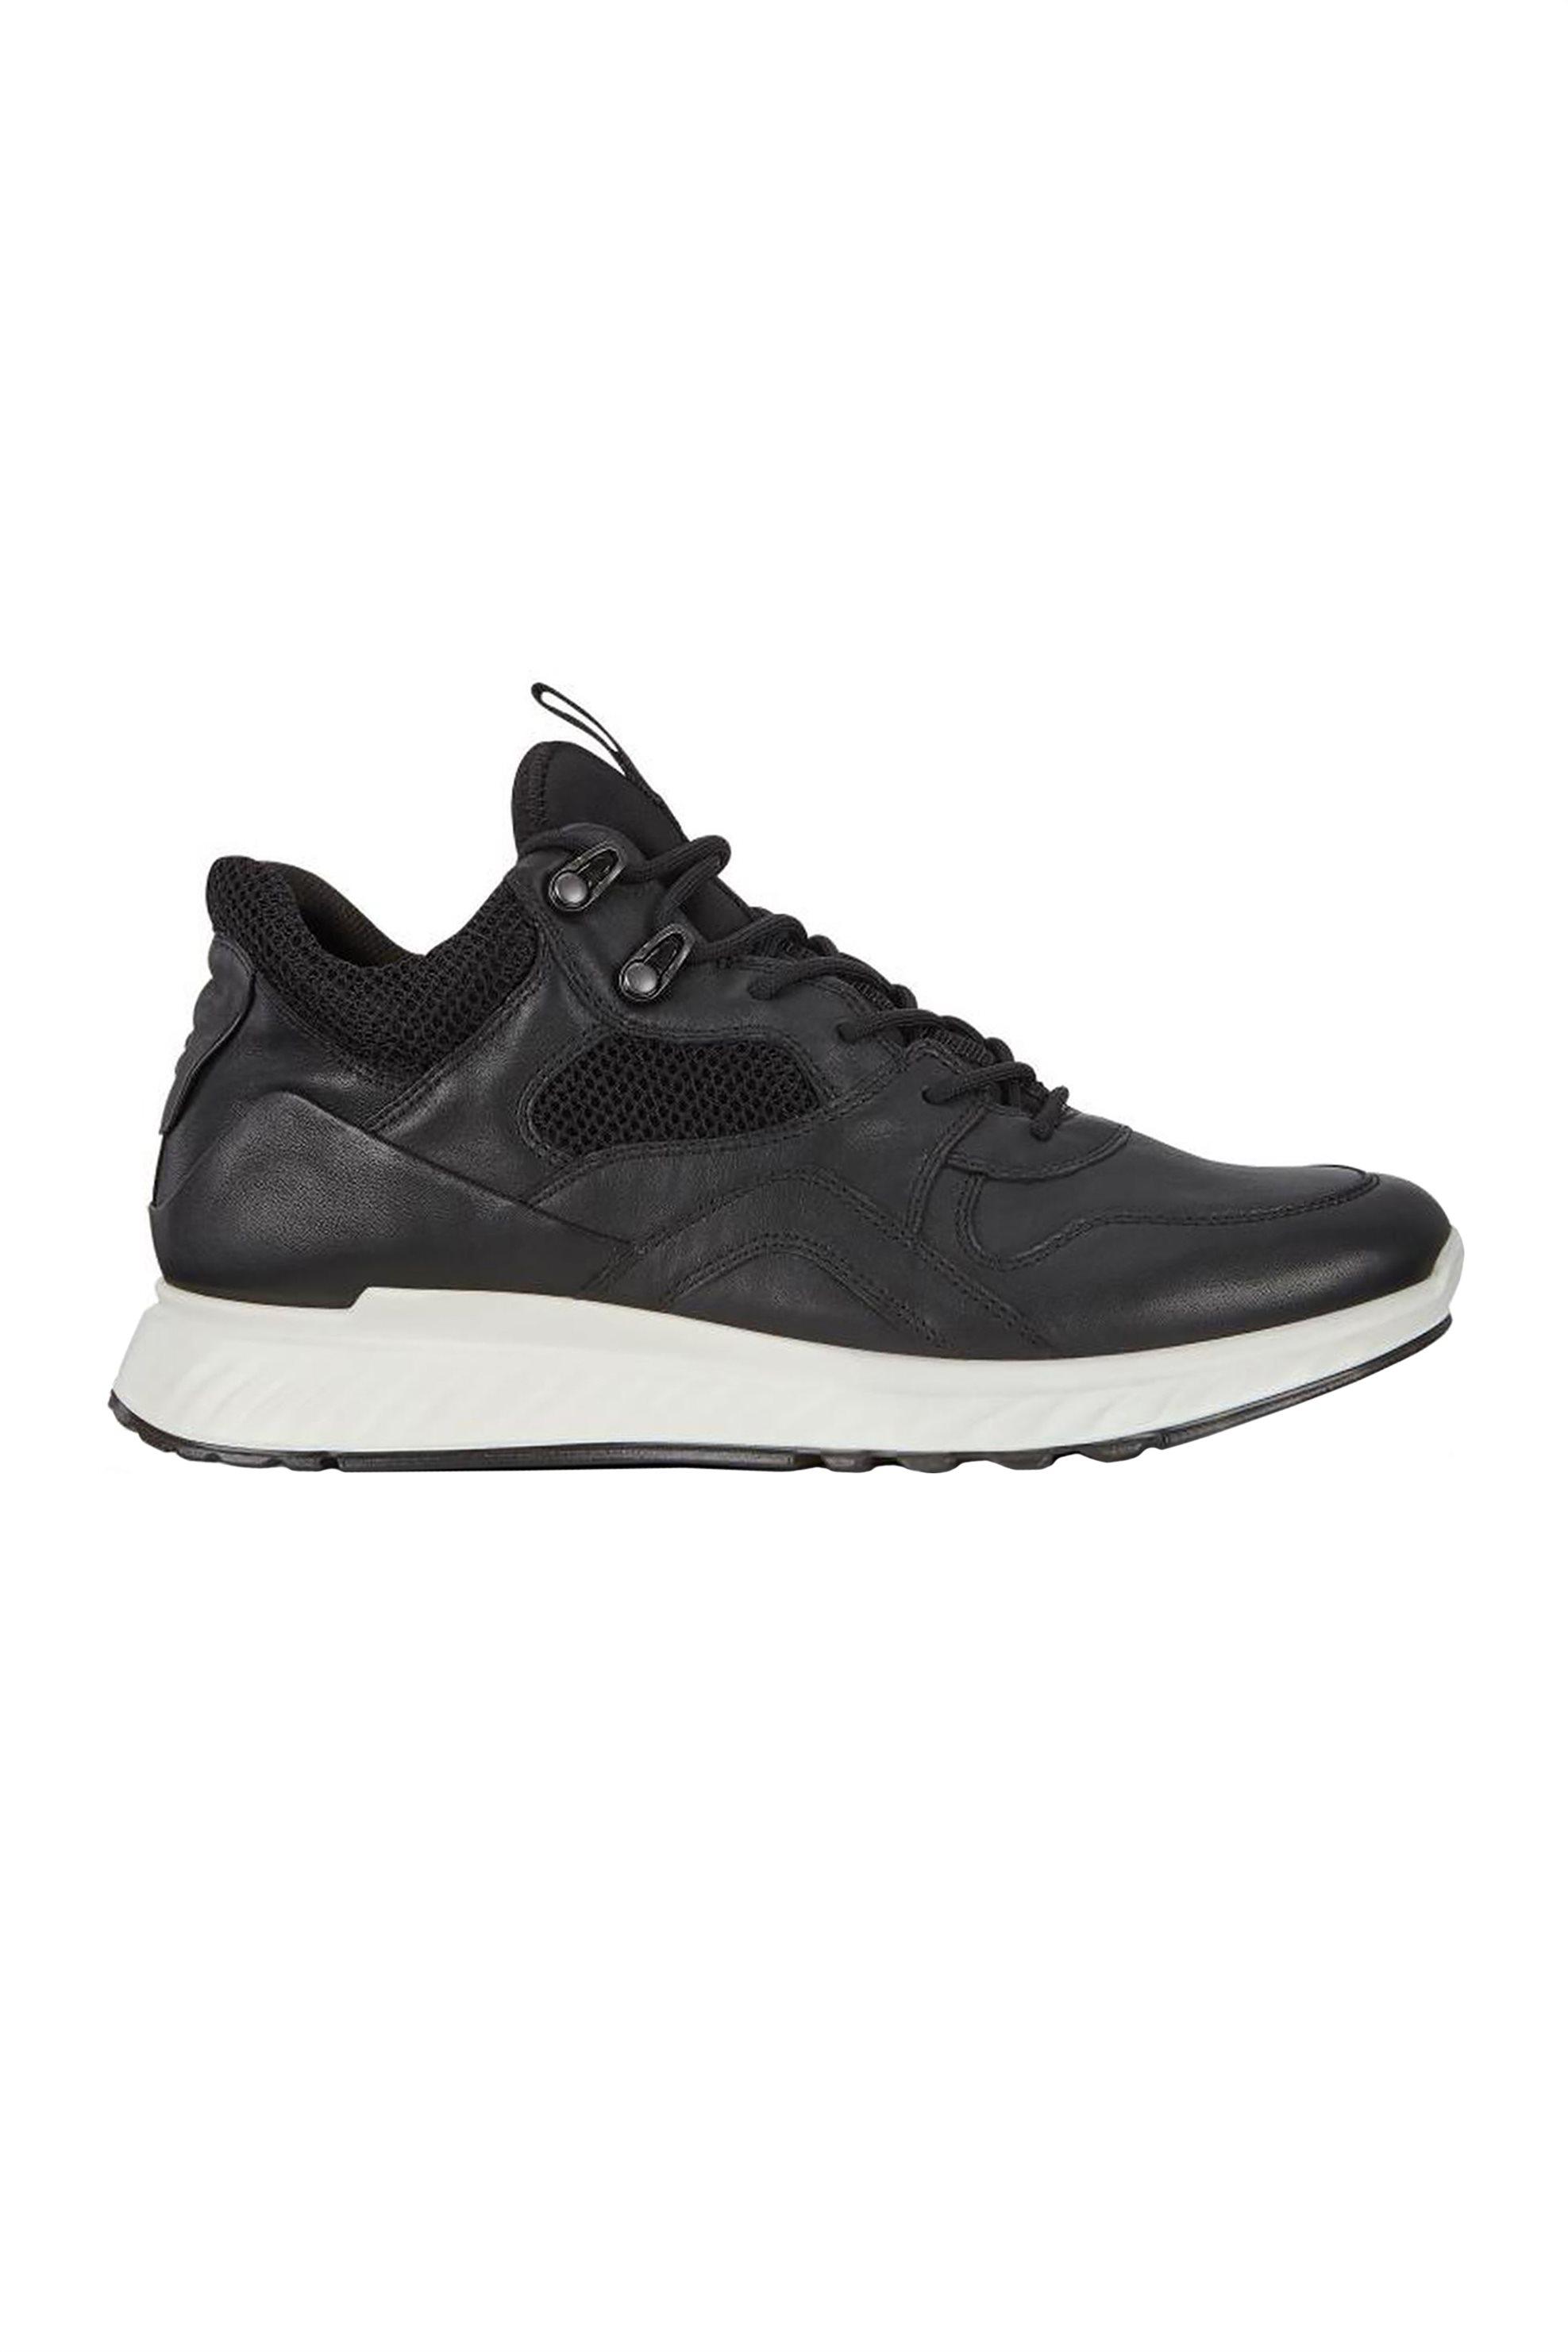 ECCO ανδρικά sneakers με διακοσμητικές ραφές – 989-837794 51052 – Μαύρο